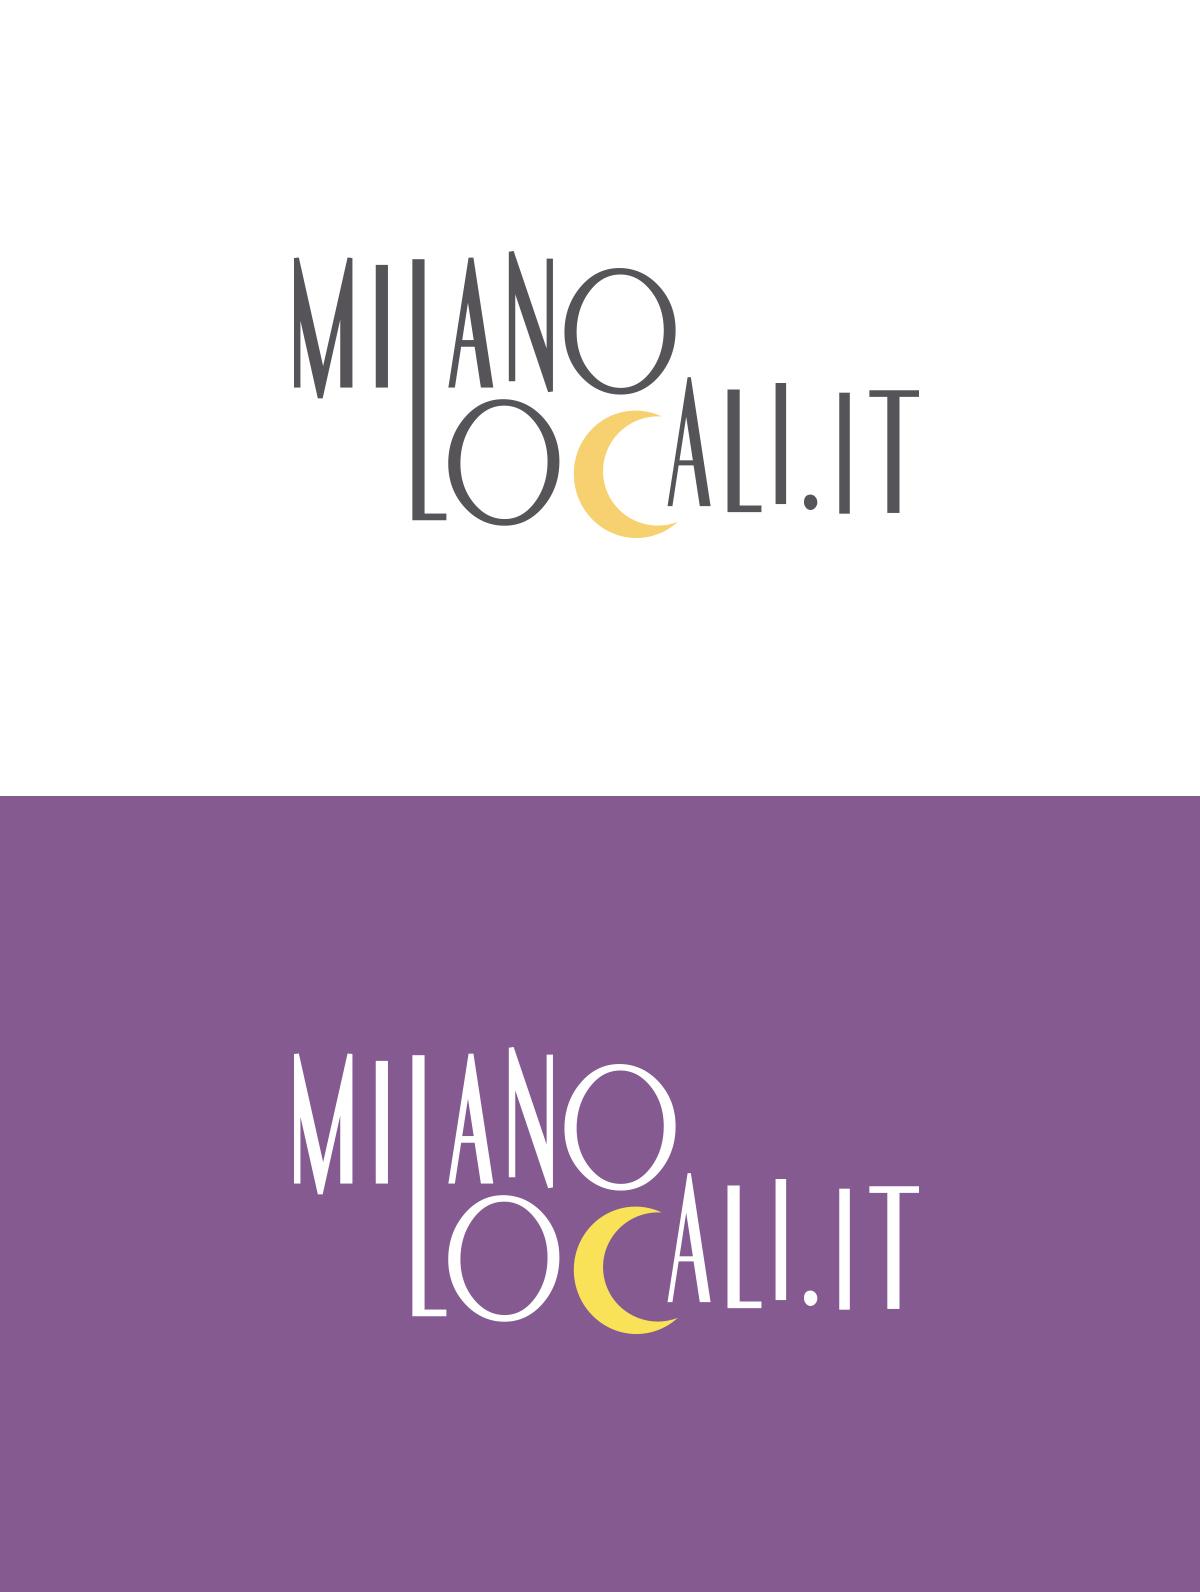 Milanolocali.it